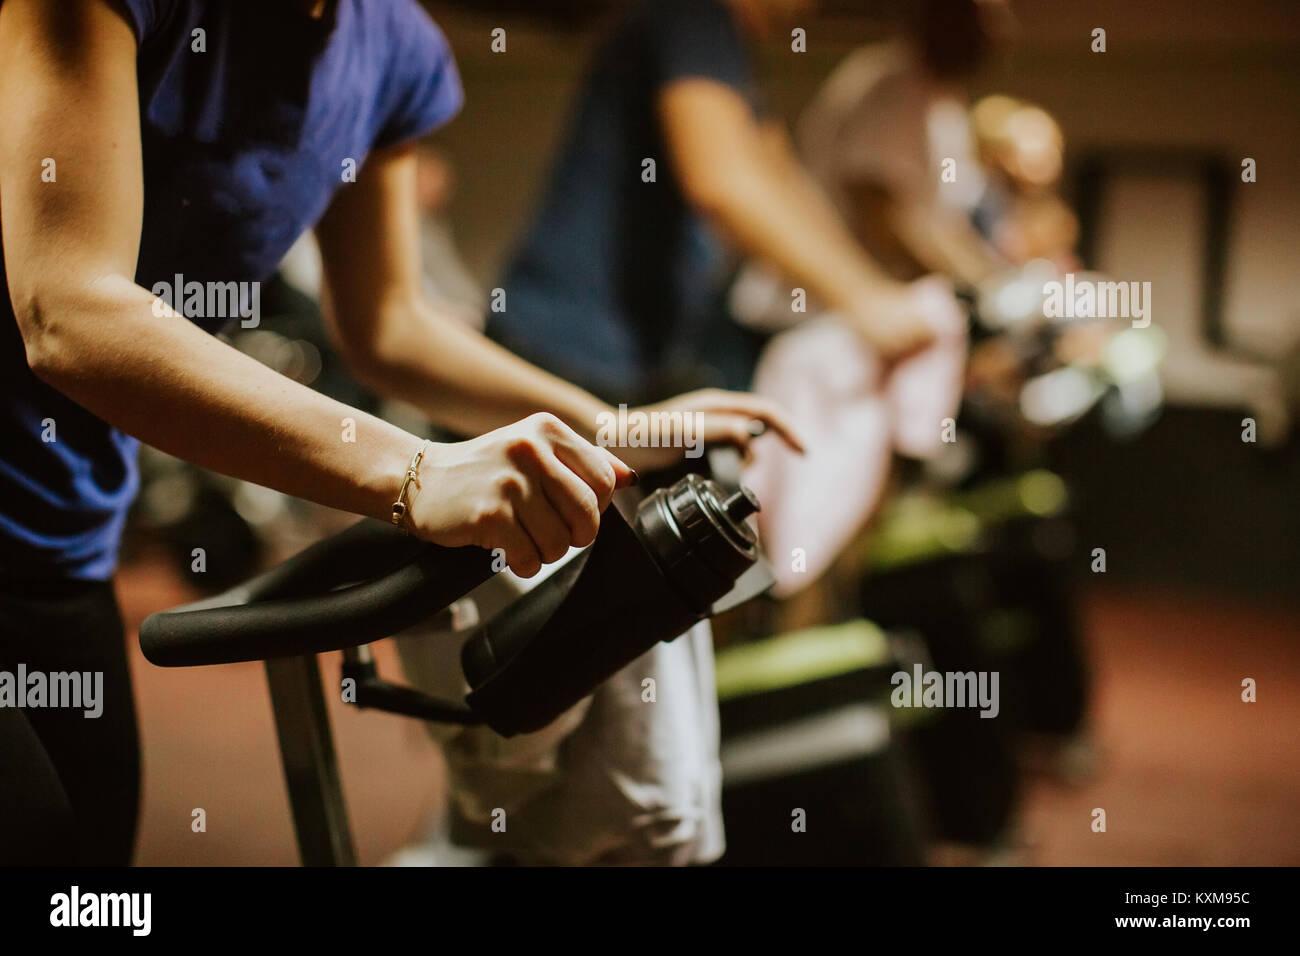 Cycling class. Fat Burning Workout - Stock Image